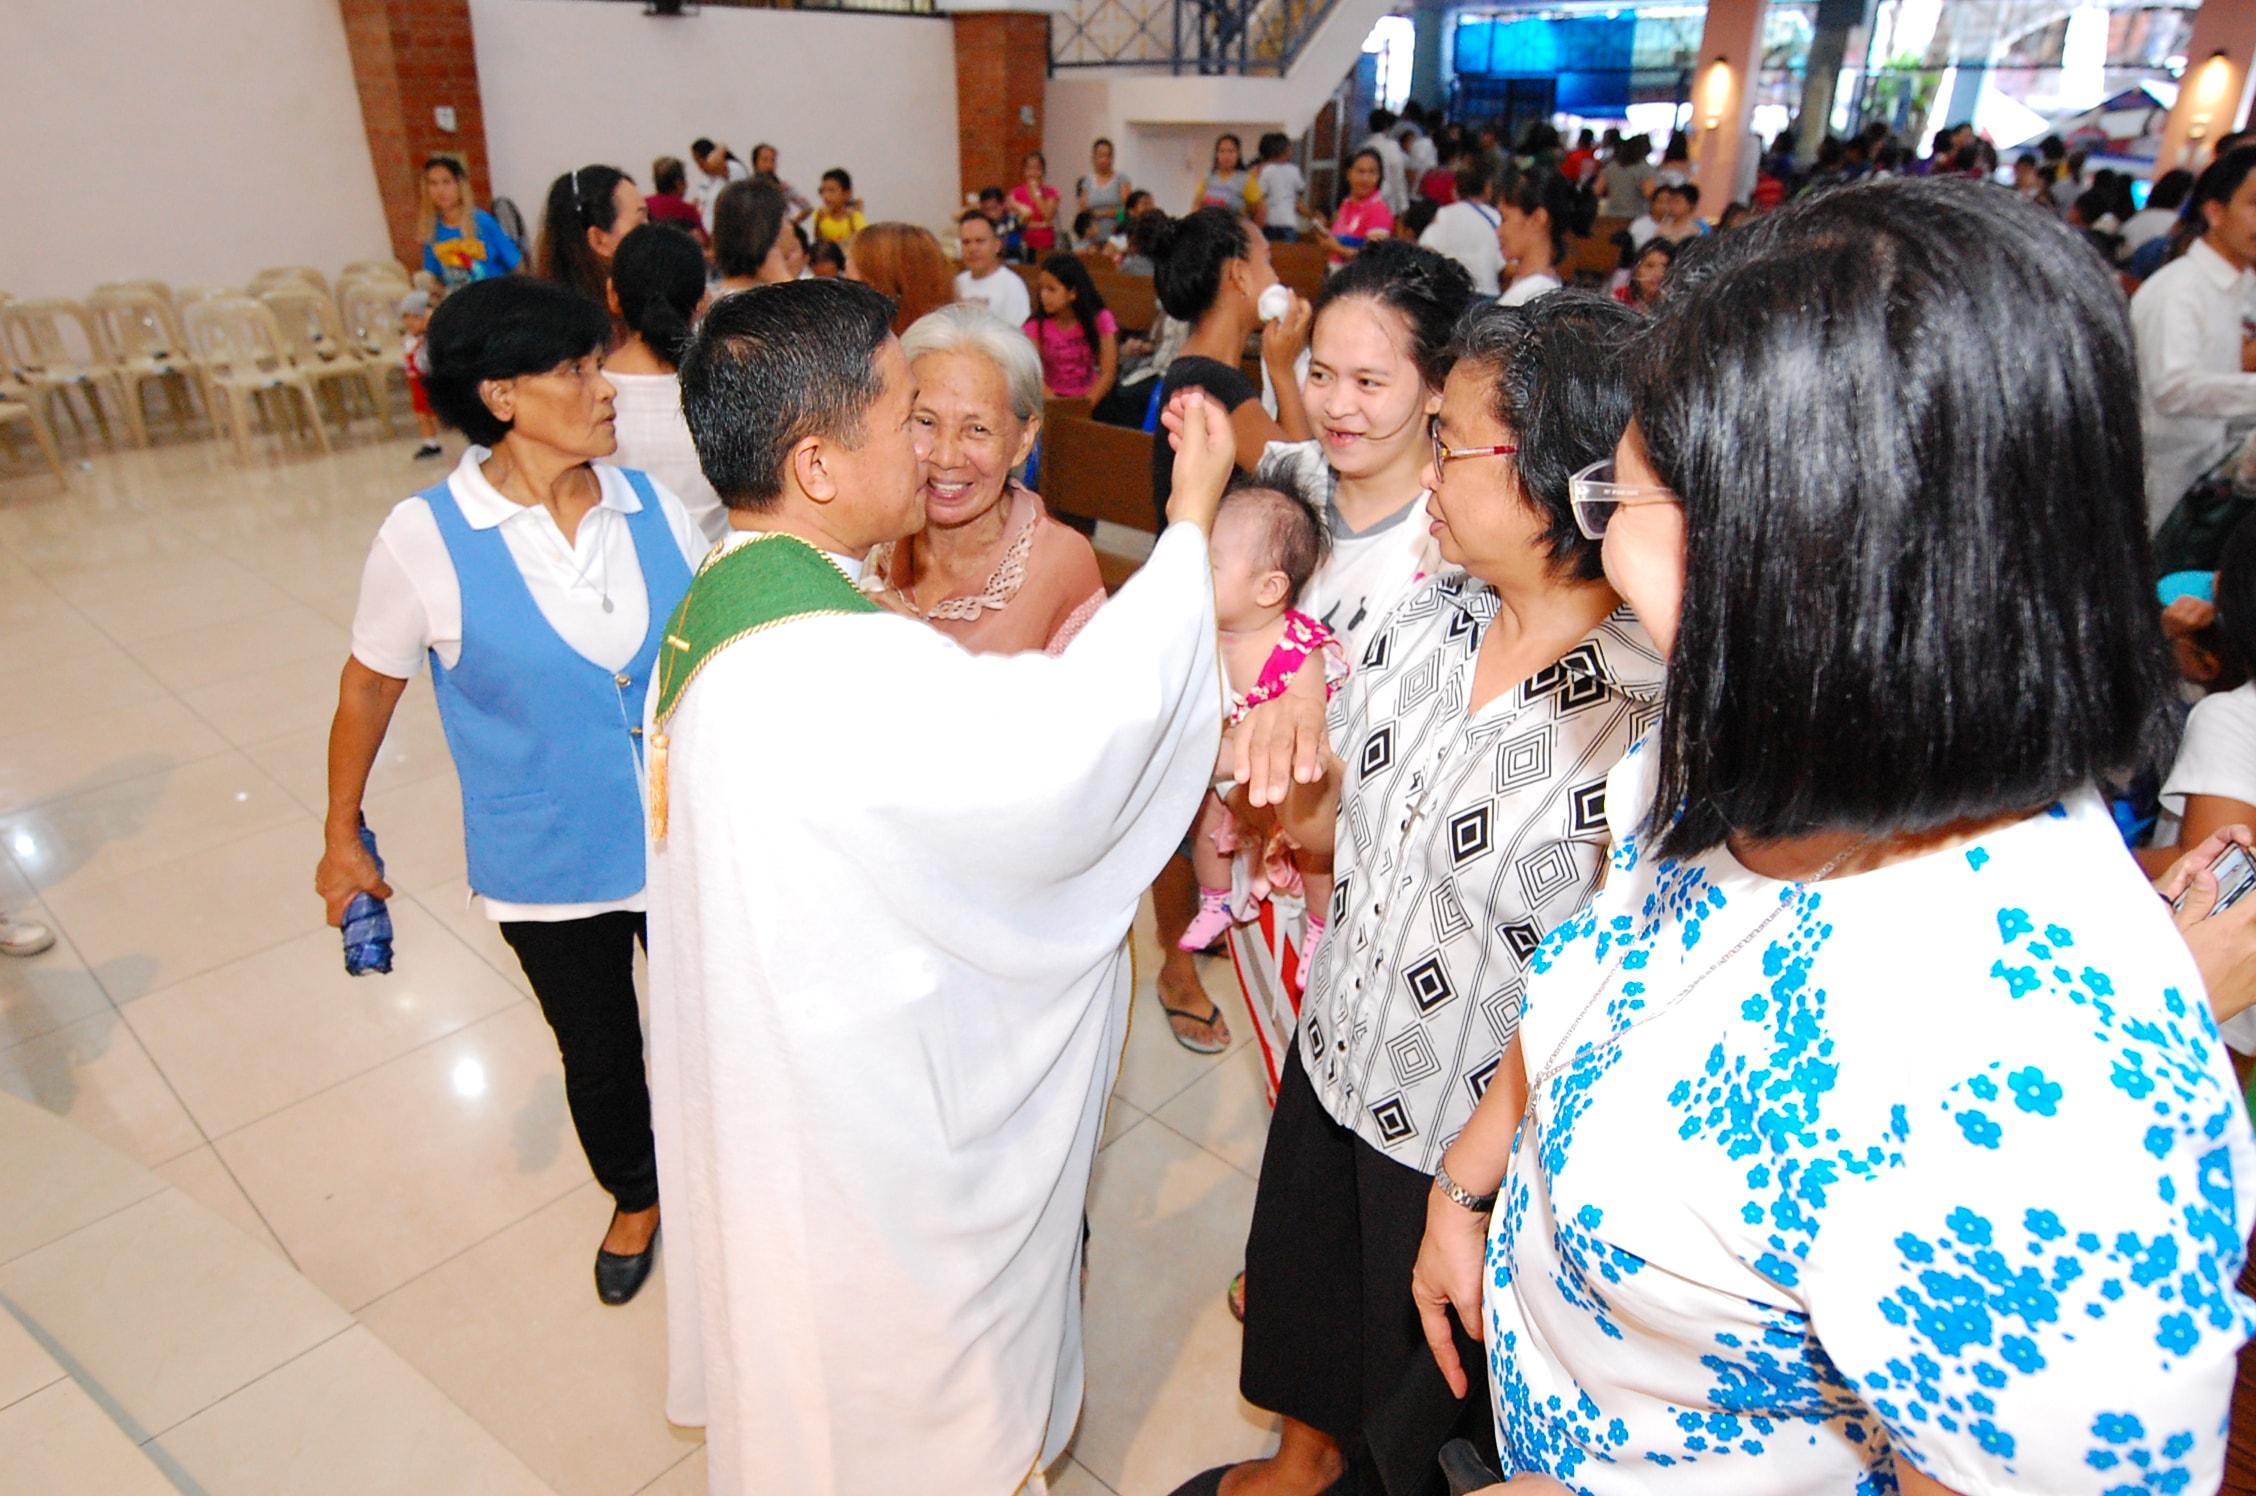 Fr. Michael Sandaga, CM, Parish Priest of Ina ng Lupang Pangako (Our Lady of the Promised Land) Parish